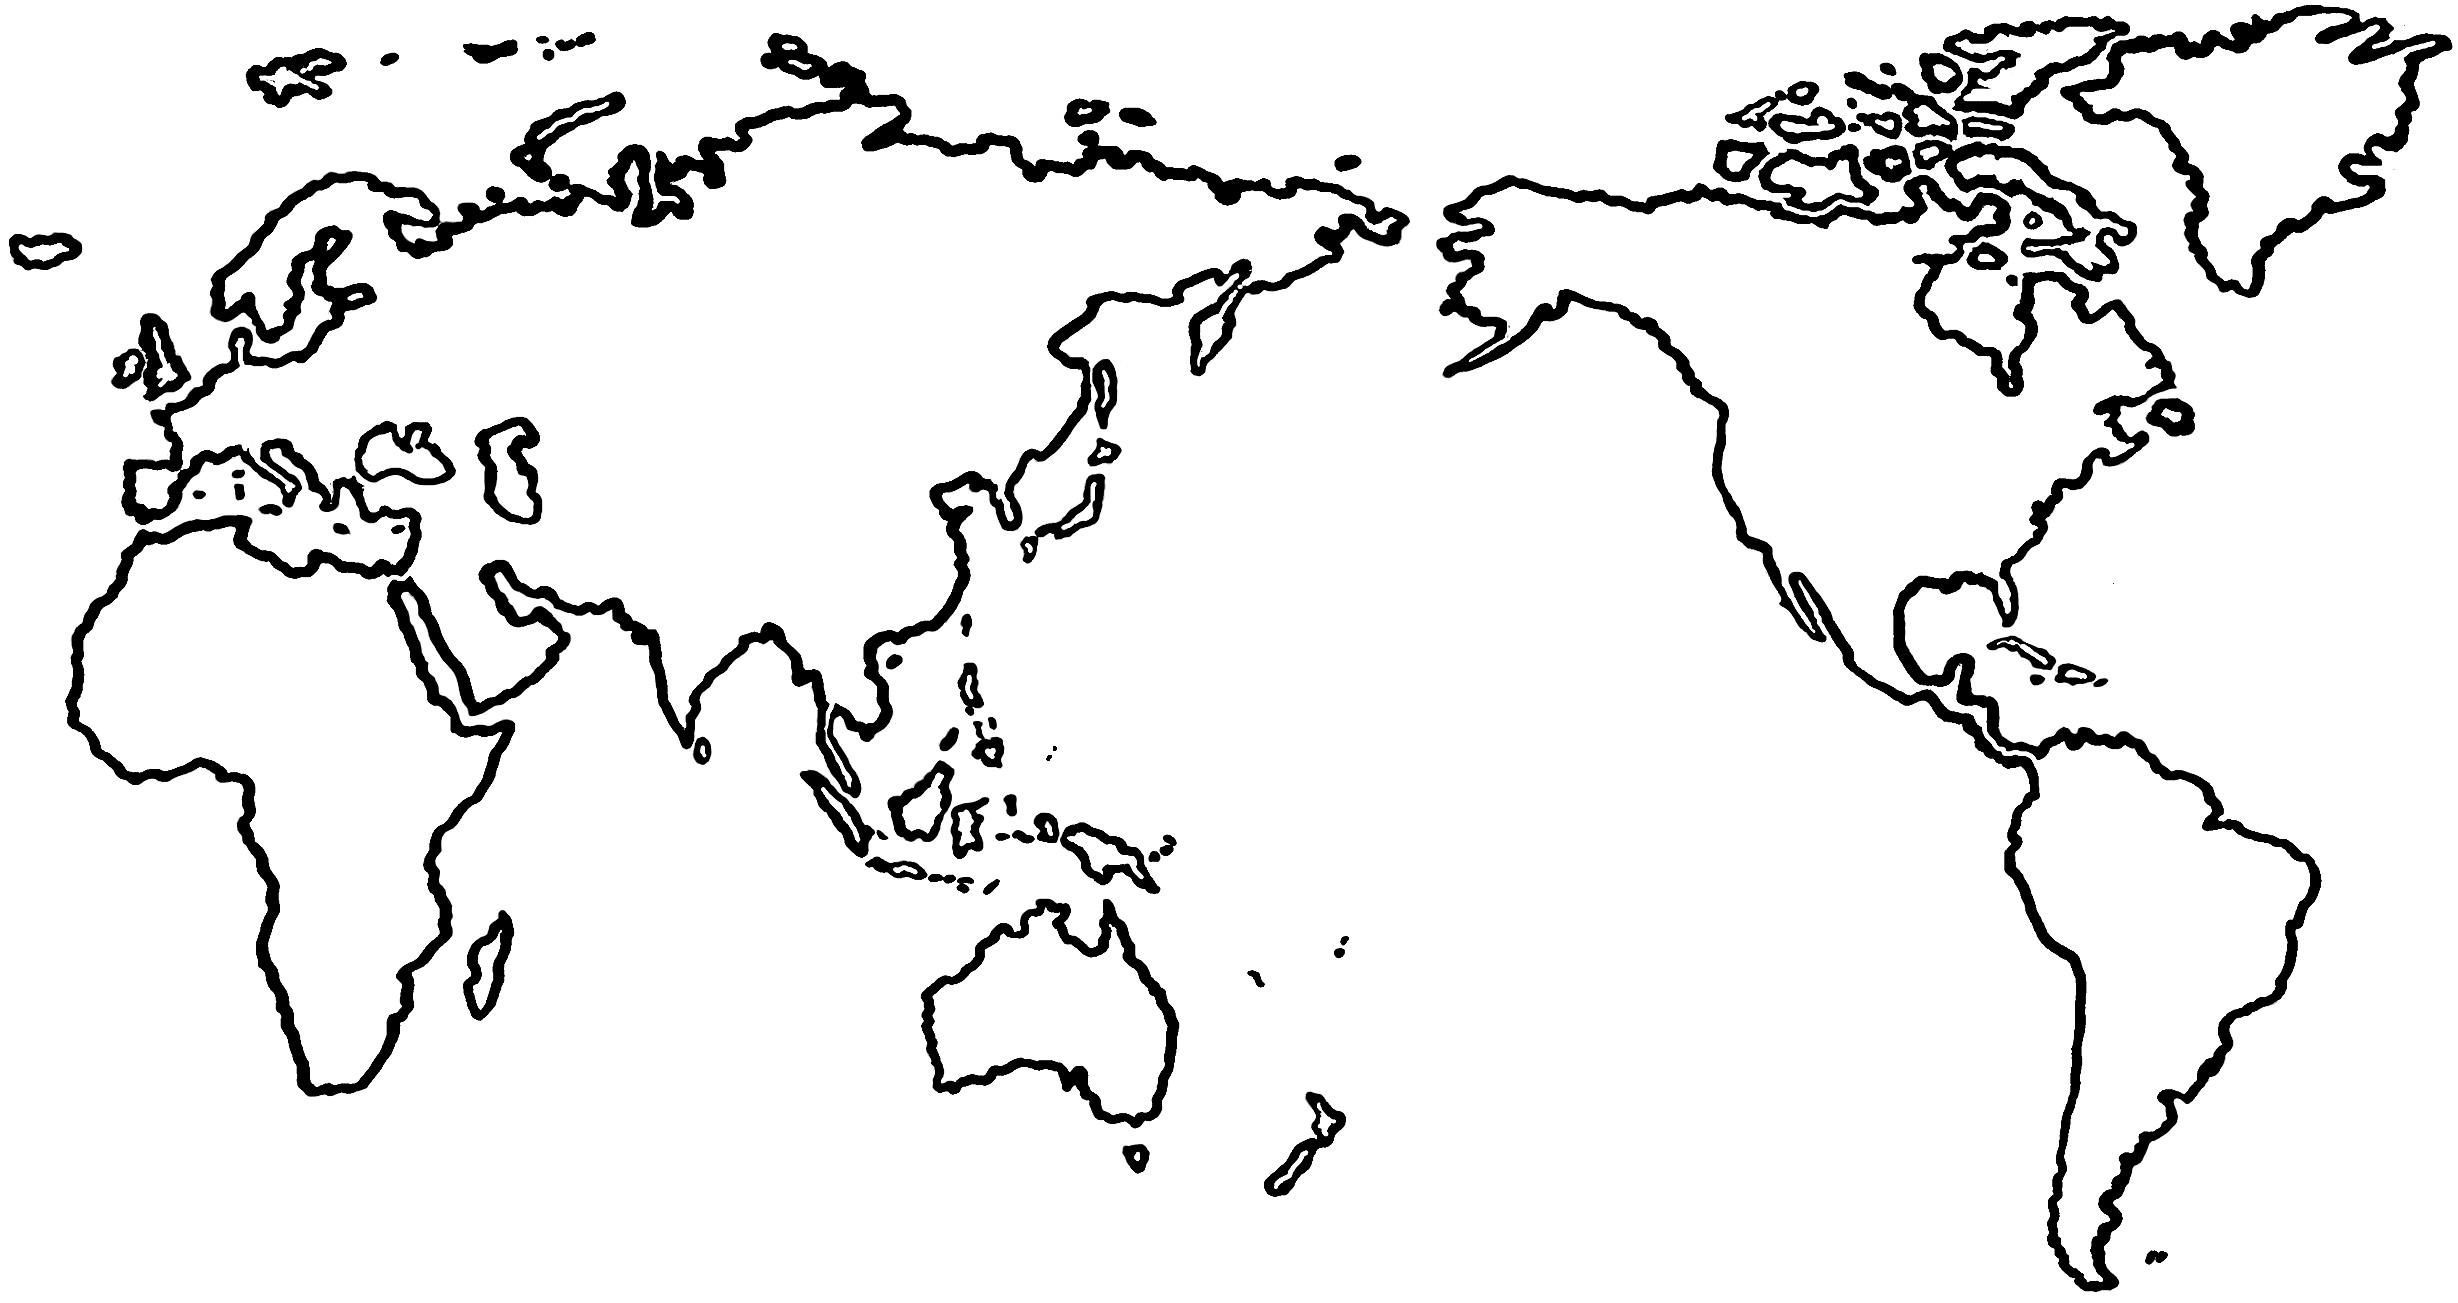 Flat World Map Clipart - Clipart Kid